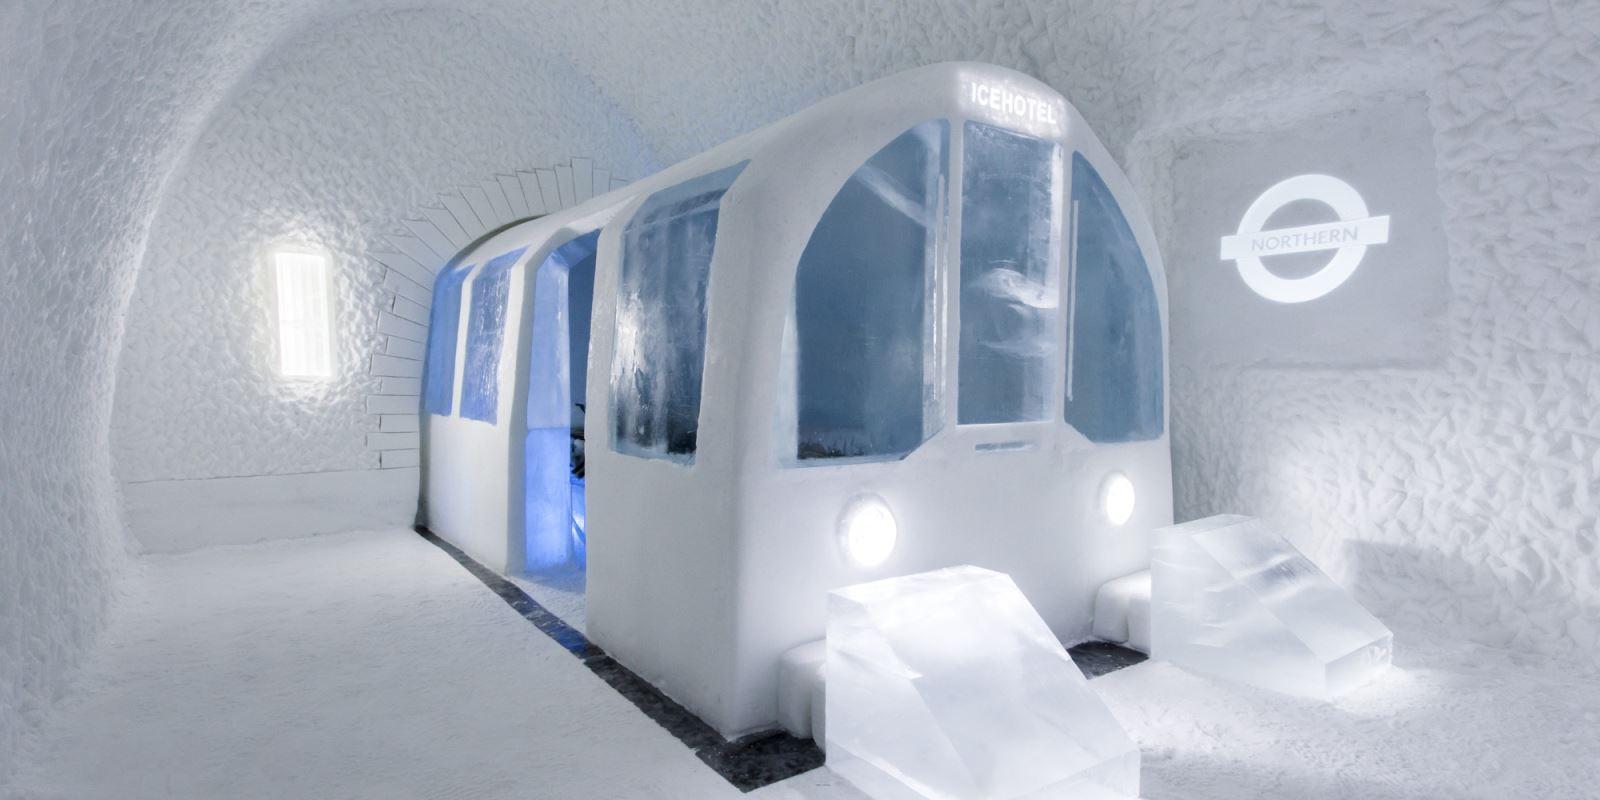 o-ICE-HOTEL-facebook